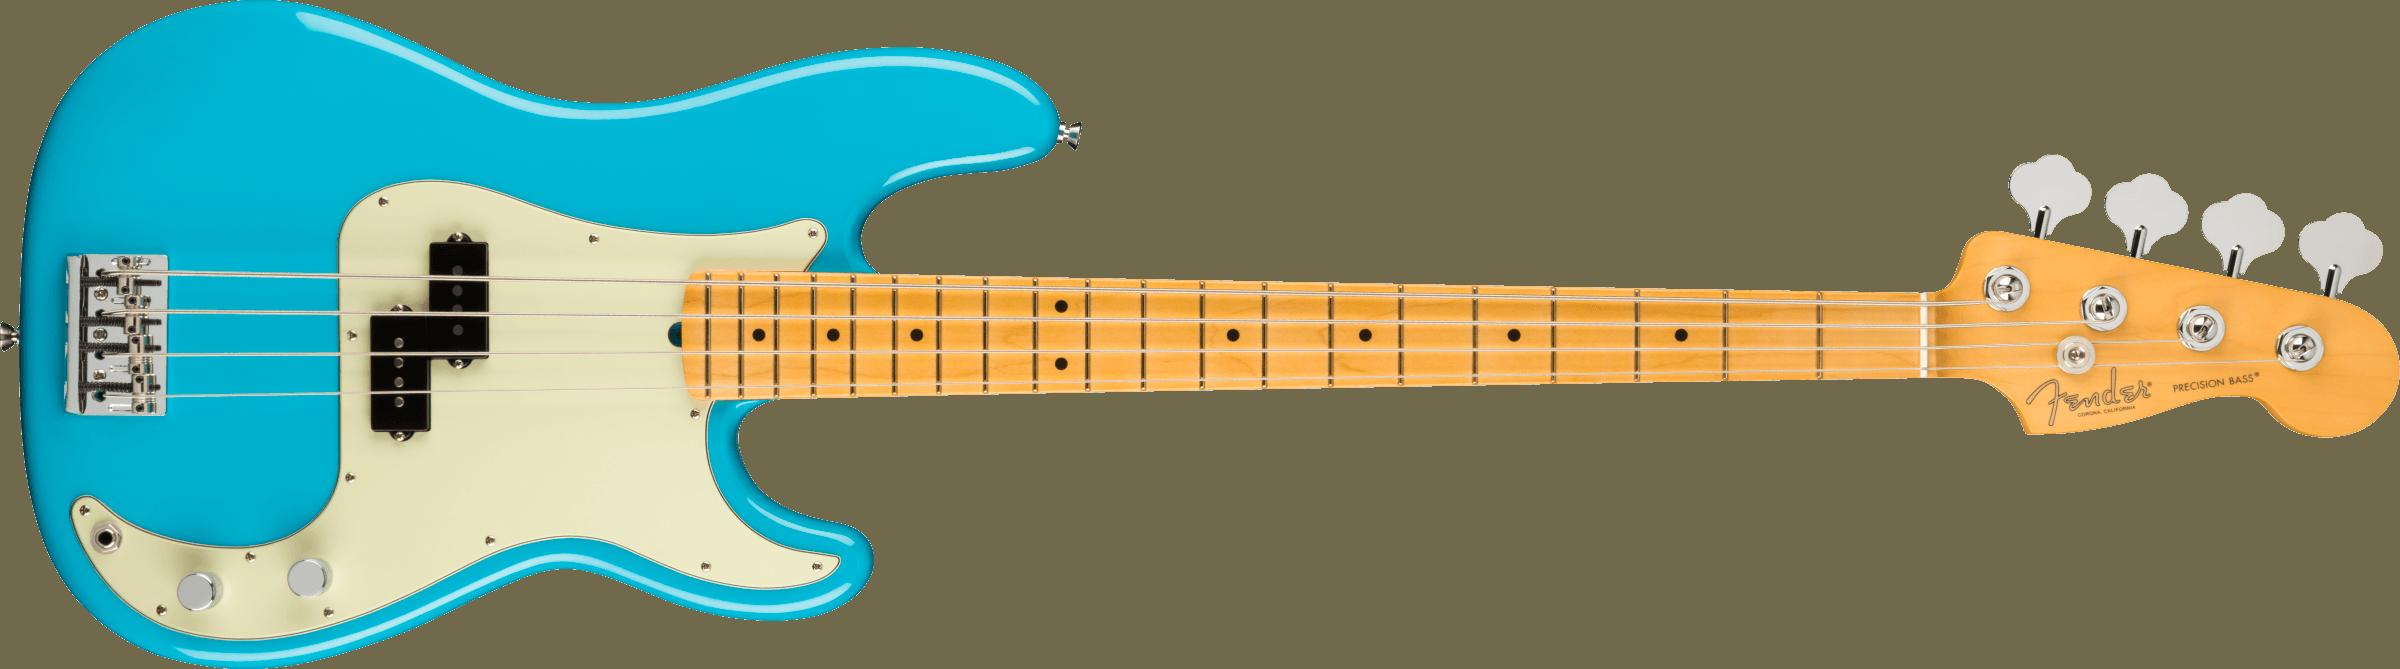 FENDER-American-Professional-II-Precision-Bass-Maple-Fingerboard-Miami-Blue-sku-571005509